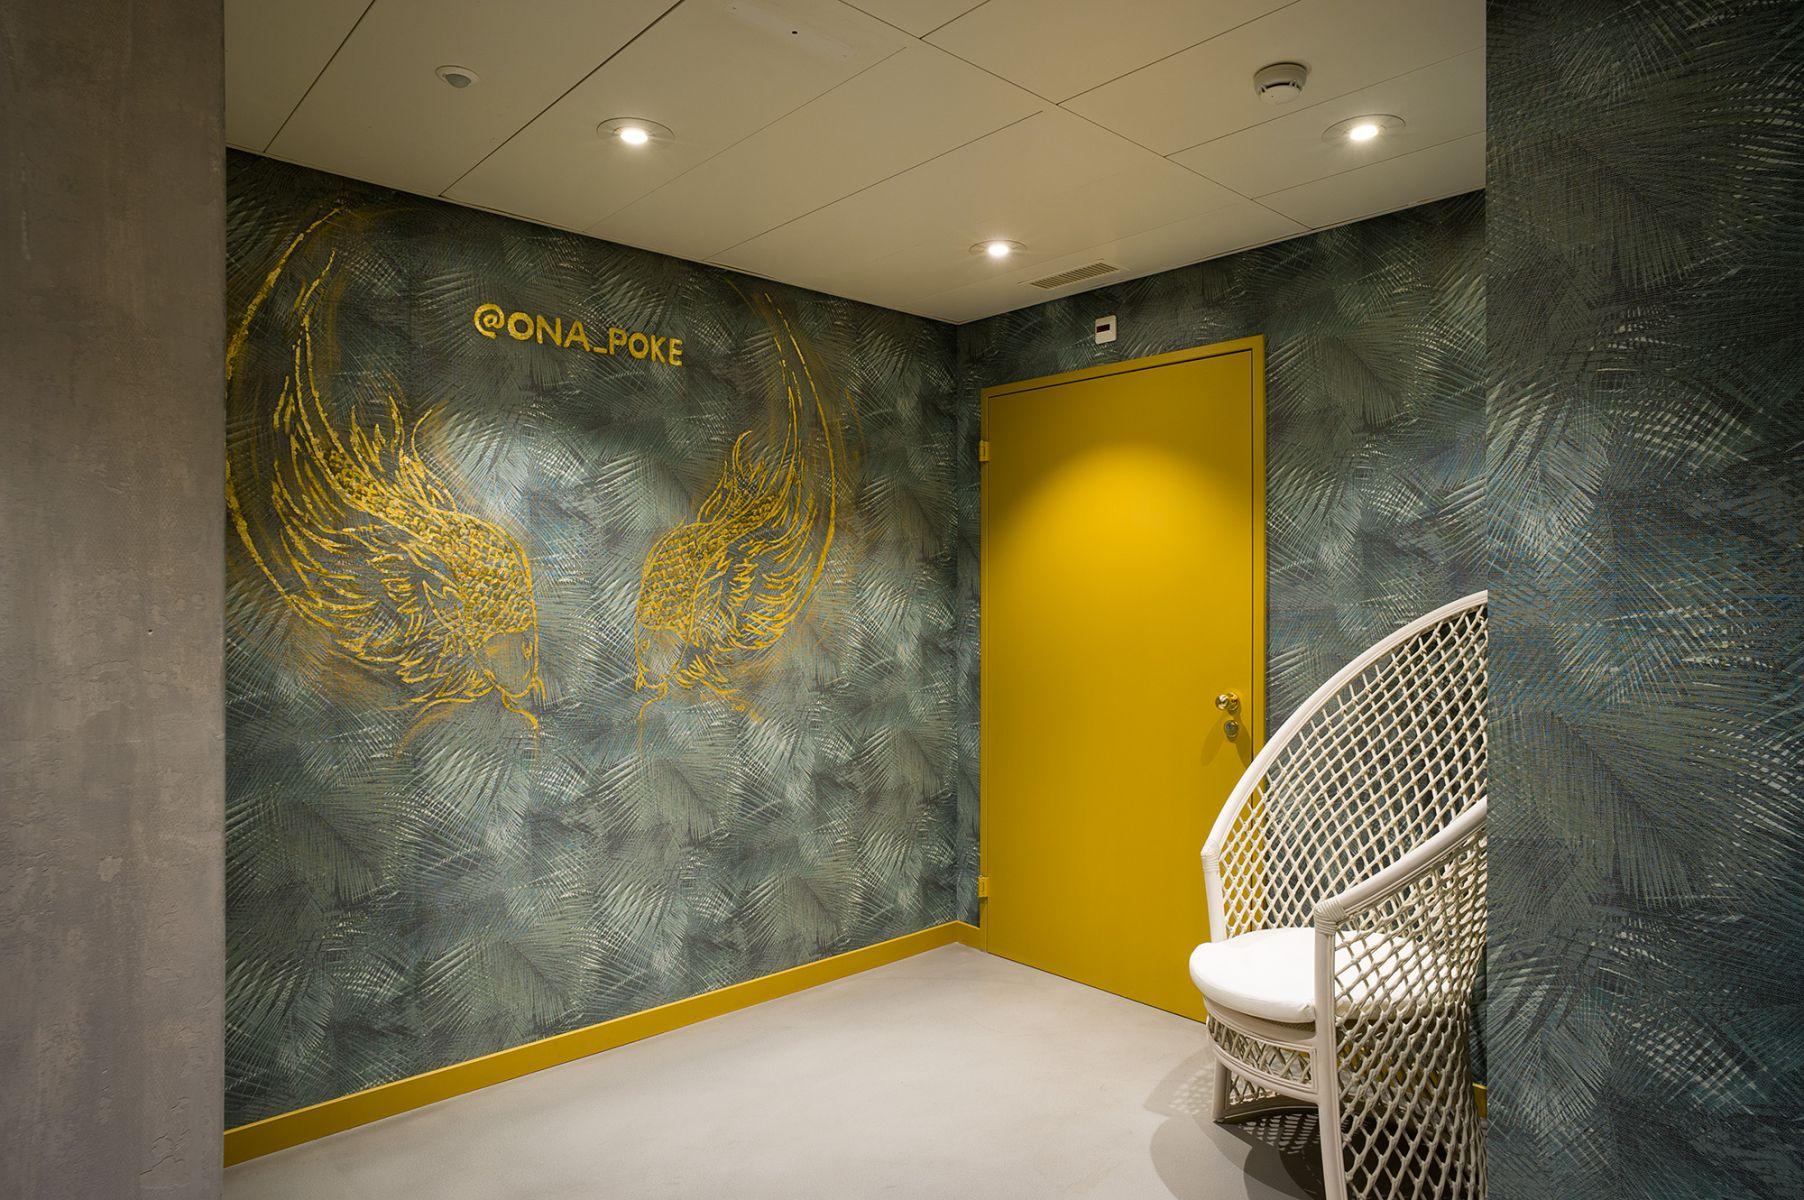 Innenarchitektur - Moritz Hillebrand